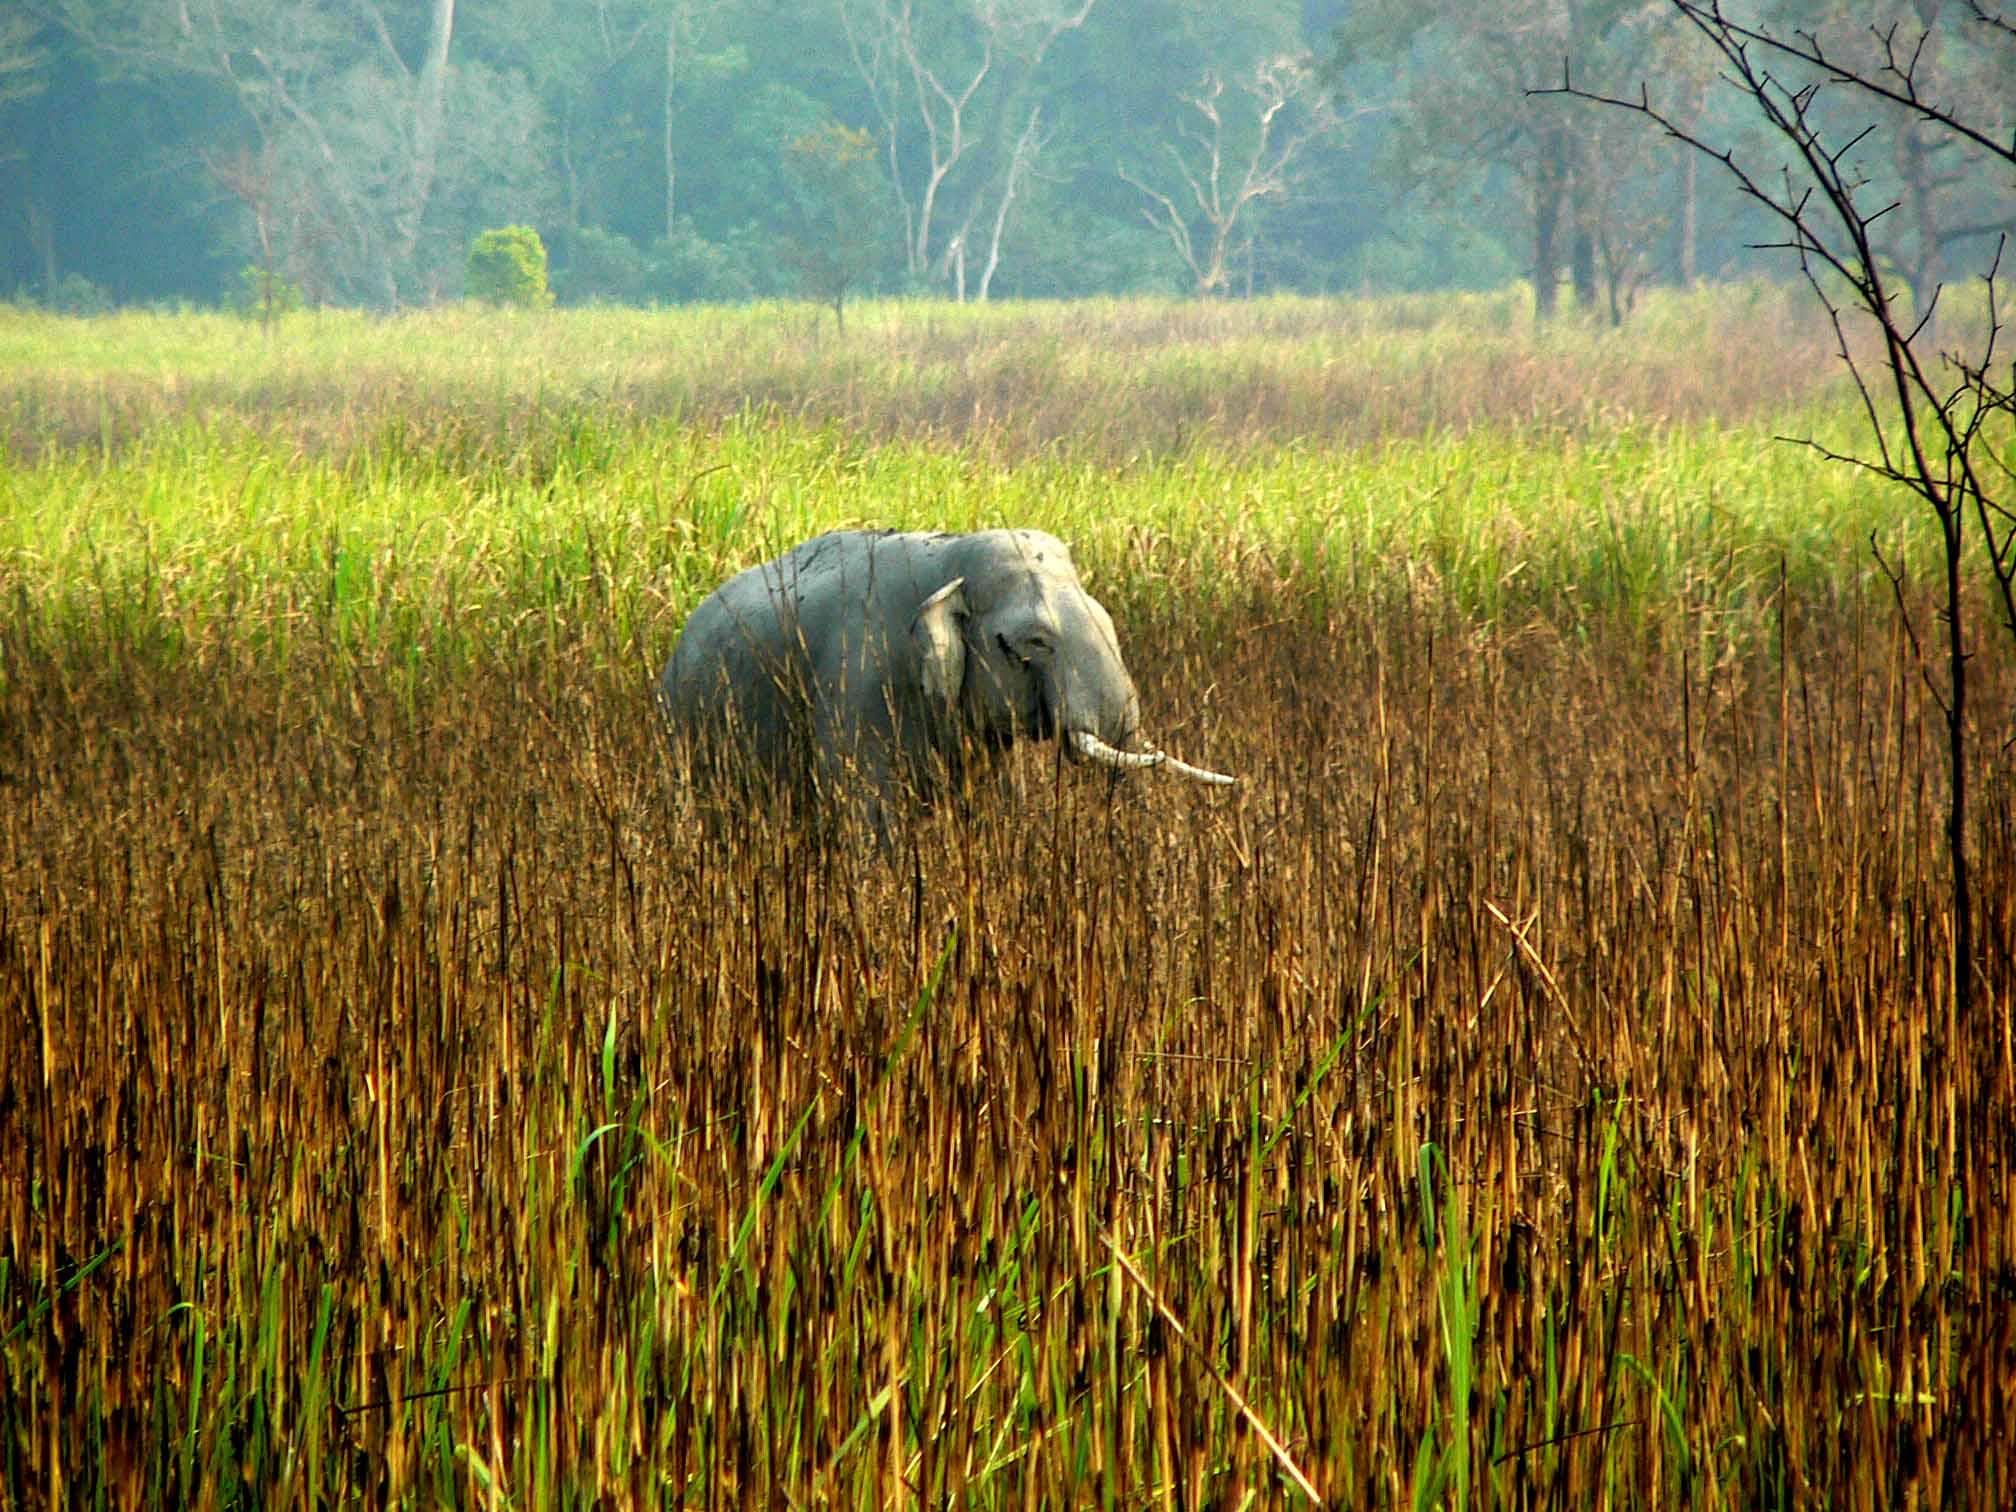 Human elephant interaction